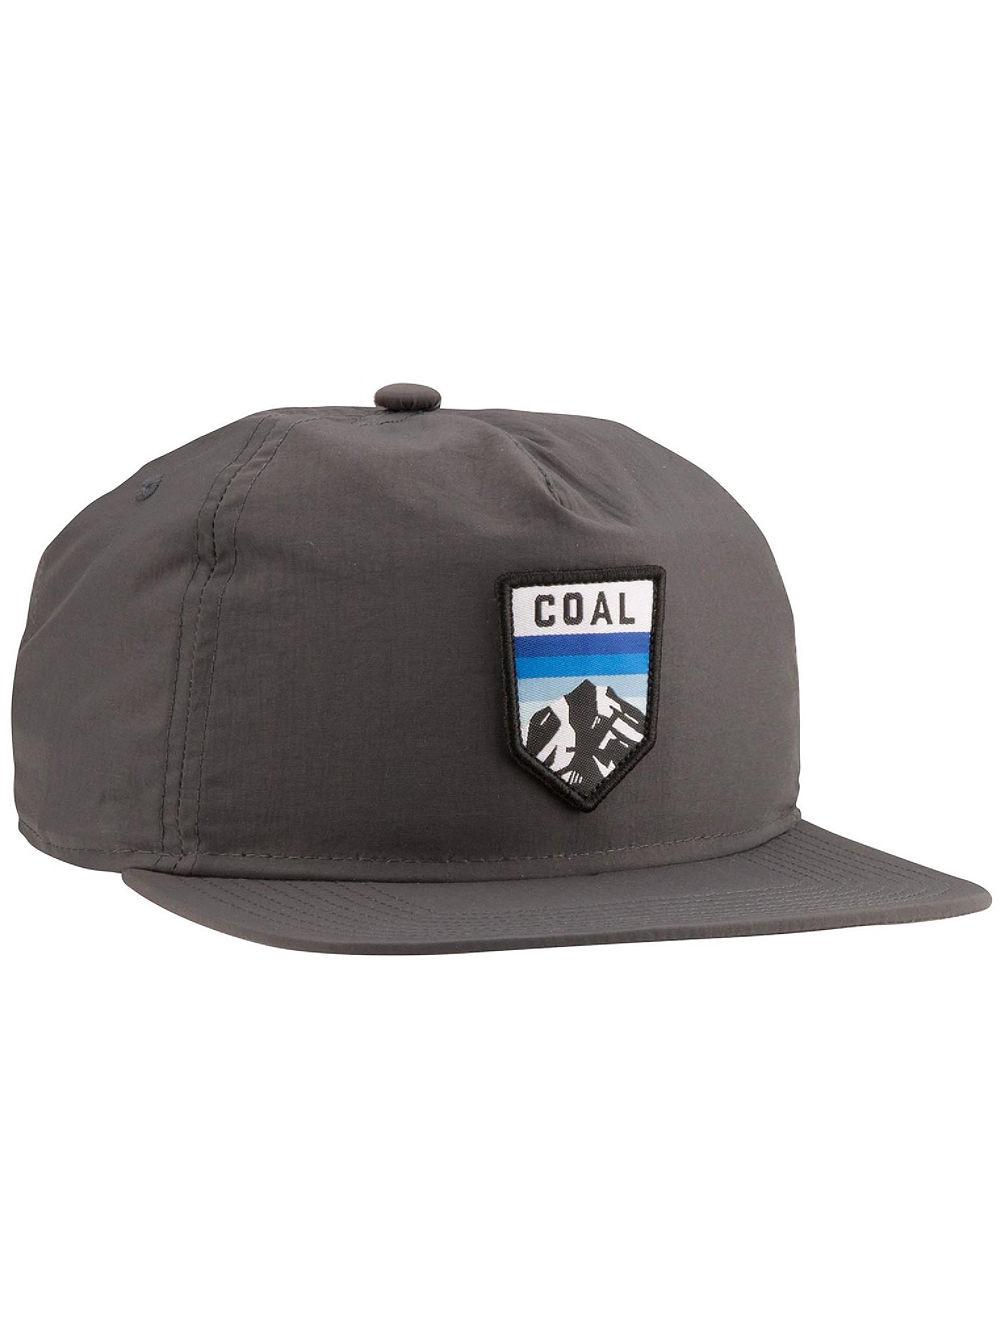 coal-the-summit-cap